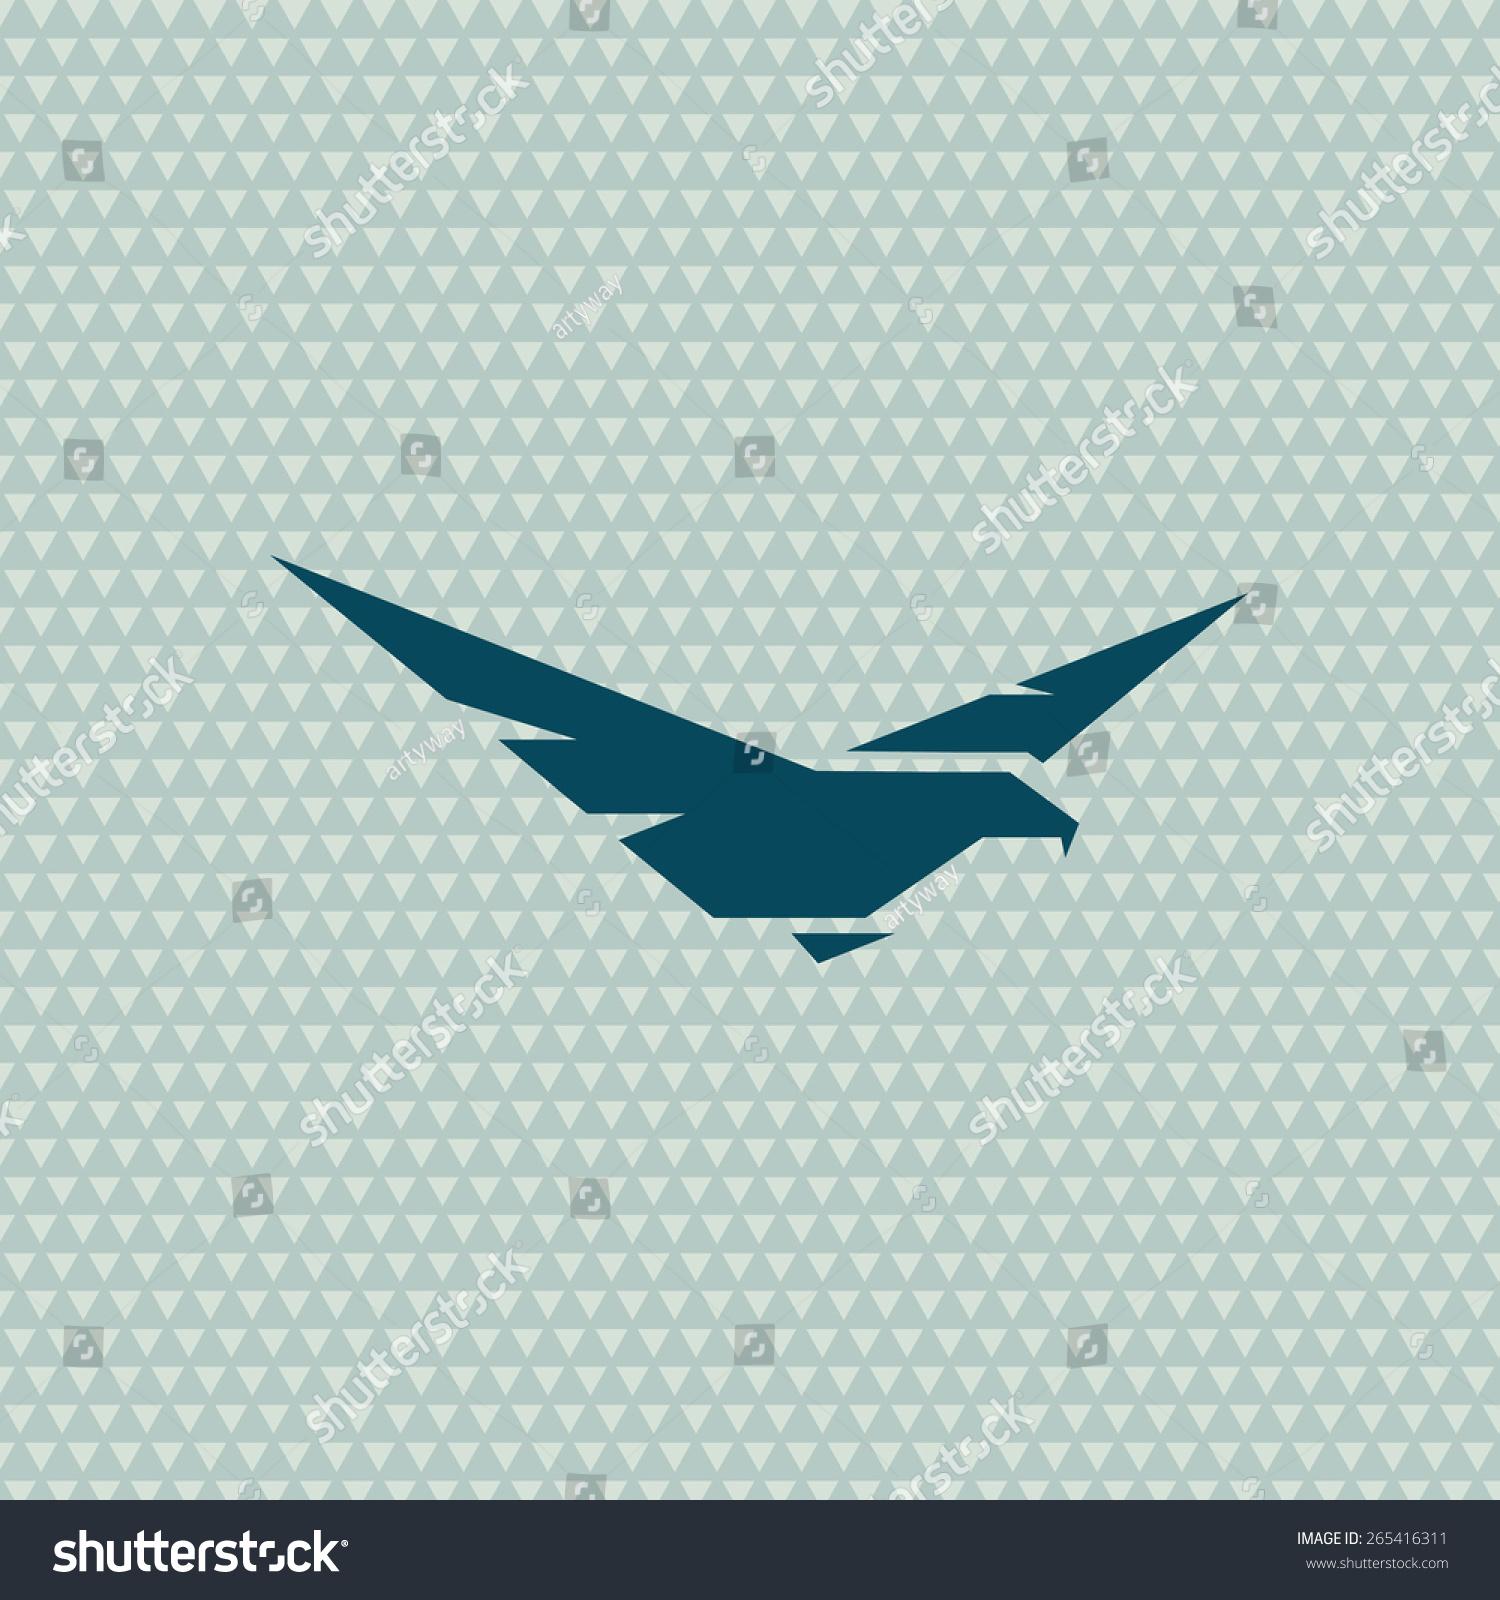 Bird Eagle Logo. Vector Abstract Pattern. Grid Seamless